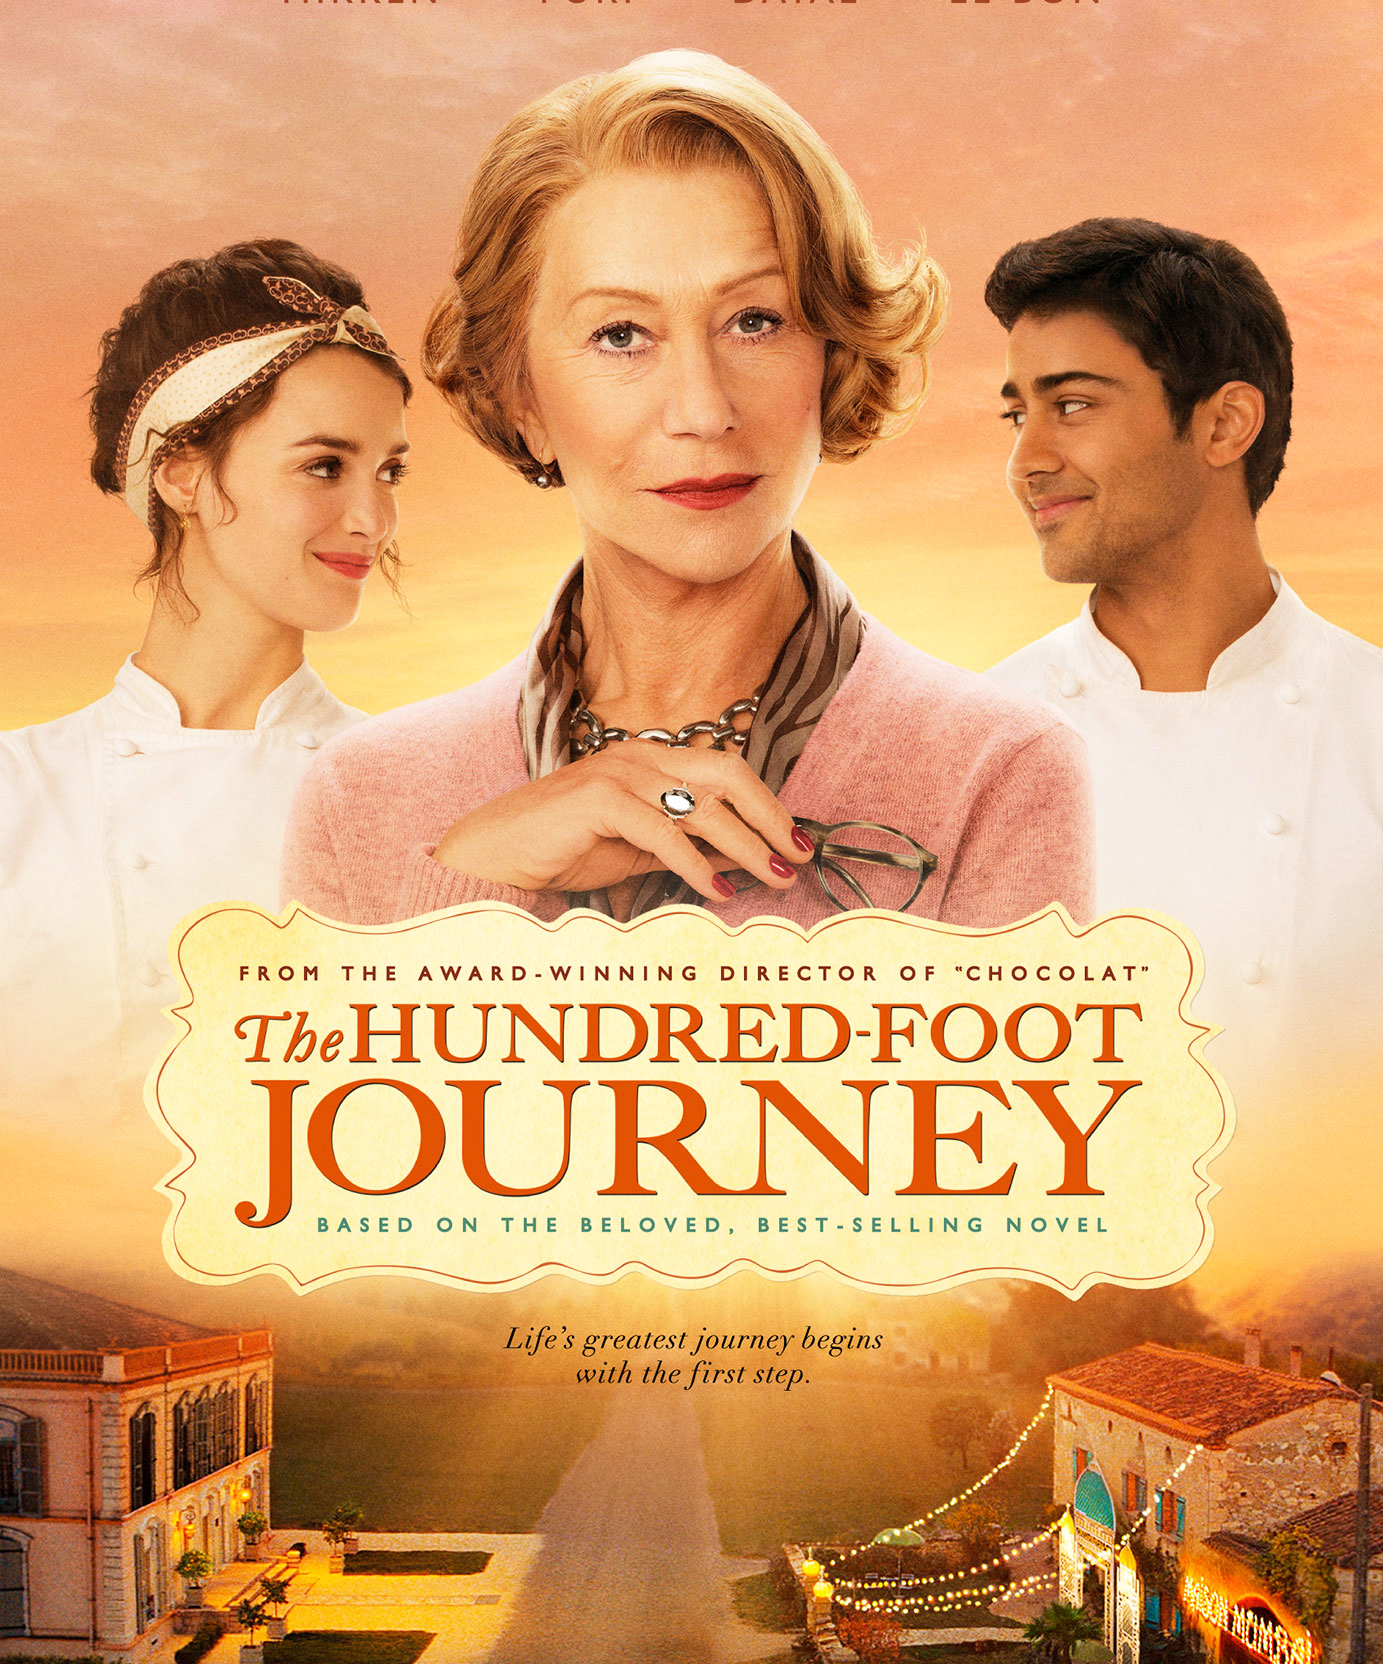 Produced by Steven Spielberg, Oprah Winfrey and Juliet Blake. Directed by Lasse Hallstrom at DreamWorks Studio